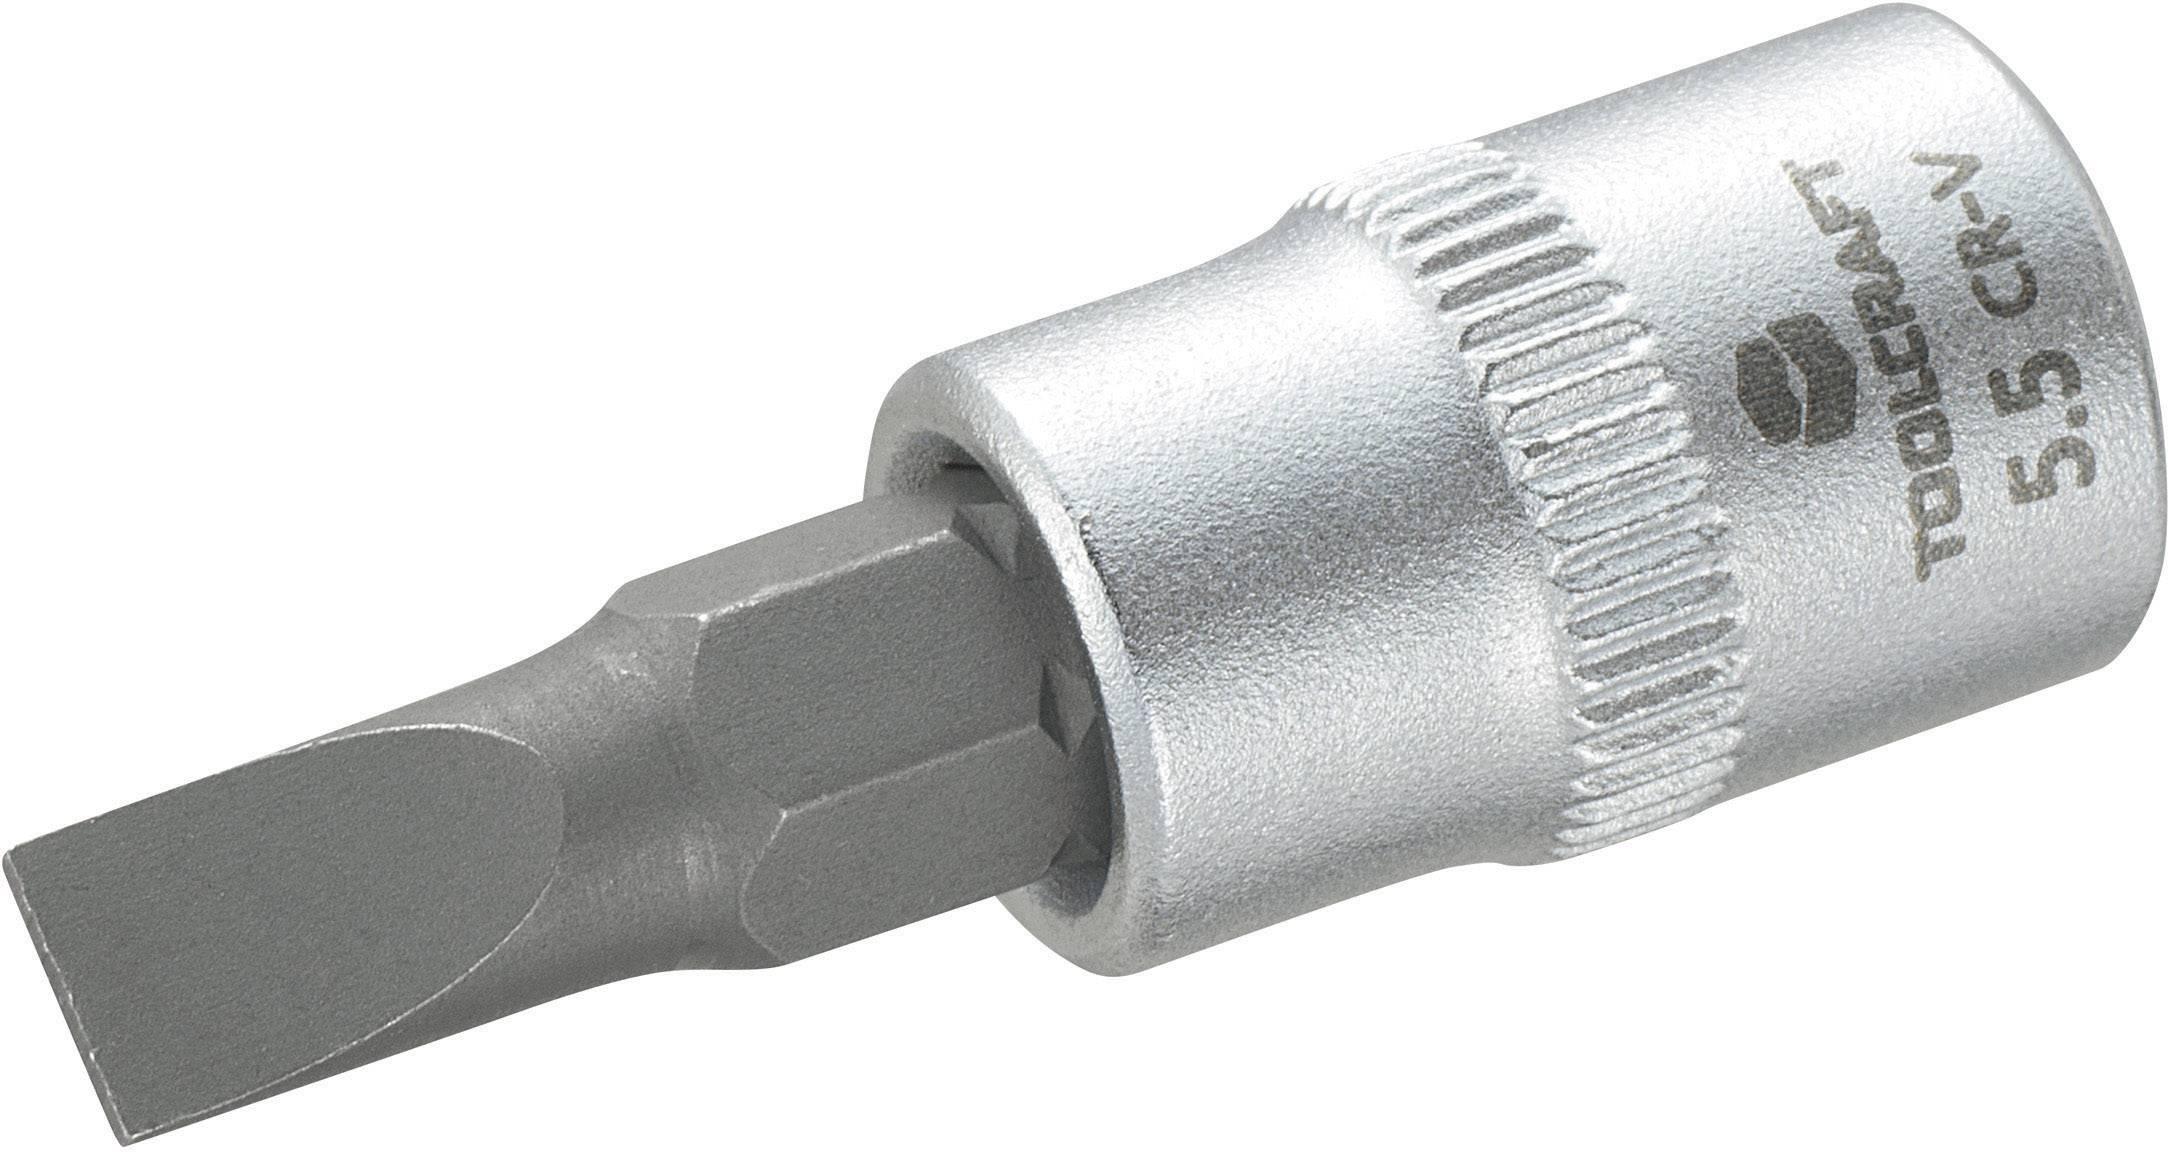 "Nástrčný kľúč TOOLCRAFT 816062, plochá, 1/4"" (6,3 mm), chróm-vanadiová oceľ"